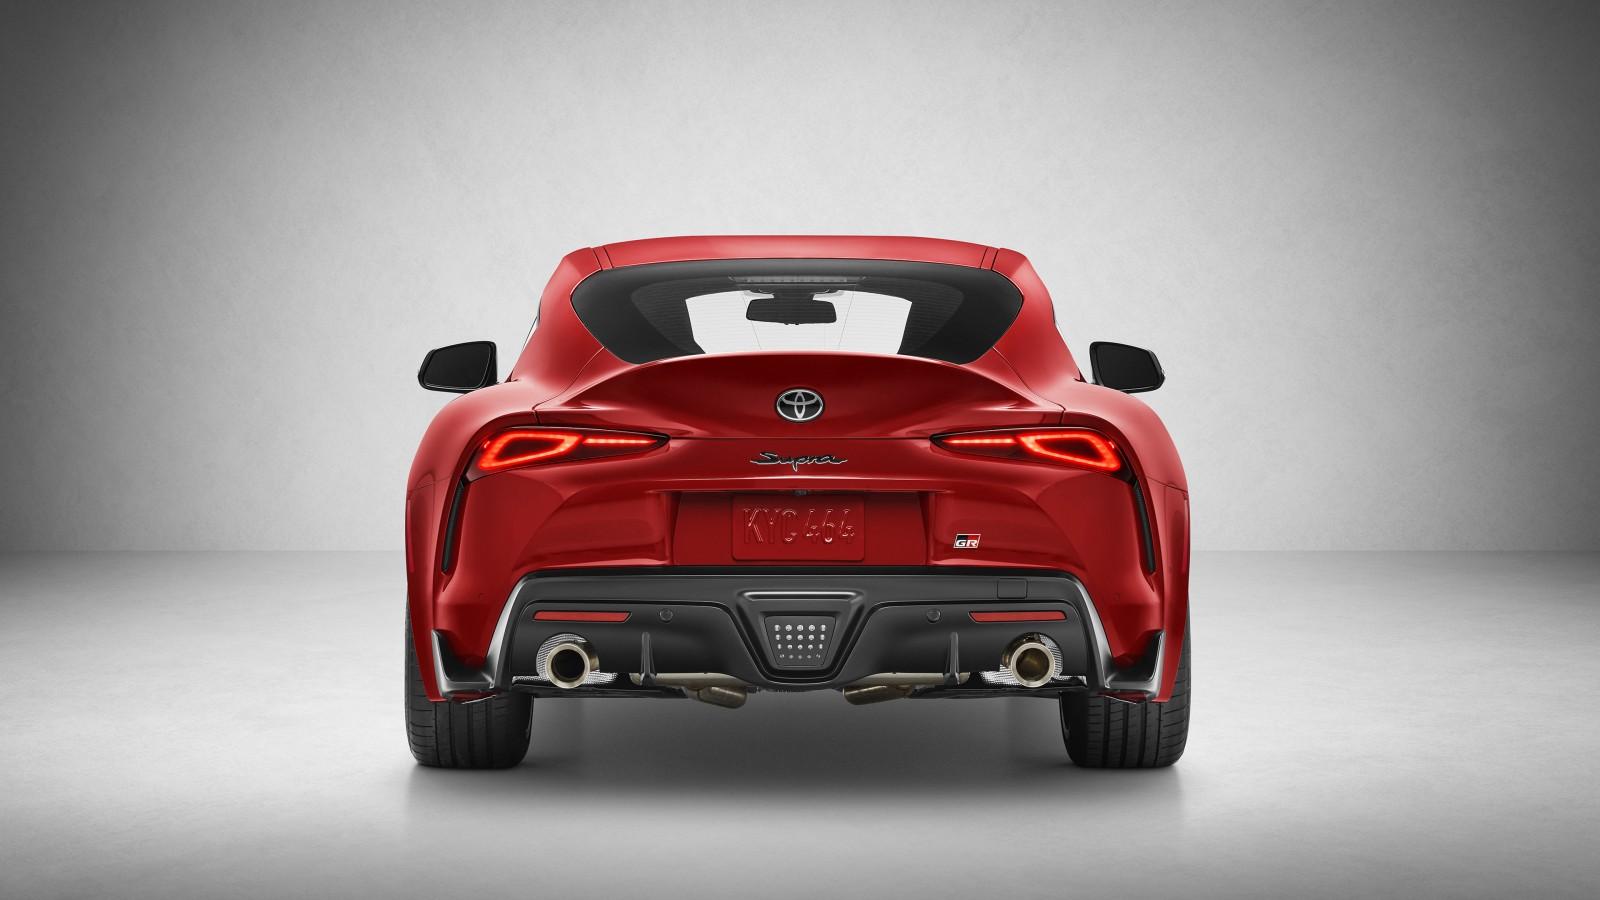 2020 Toyota GR Supra 4K 4 Wallpaper